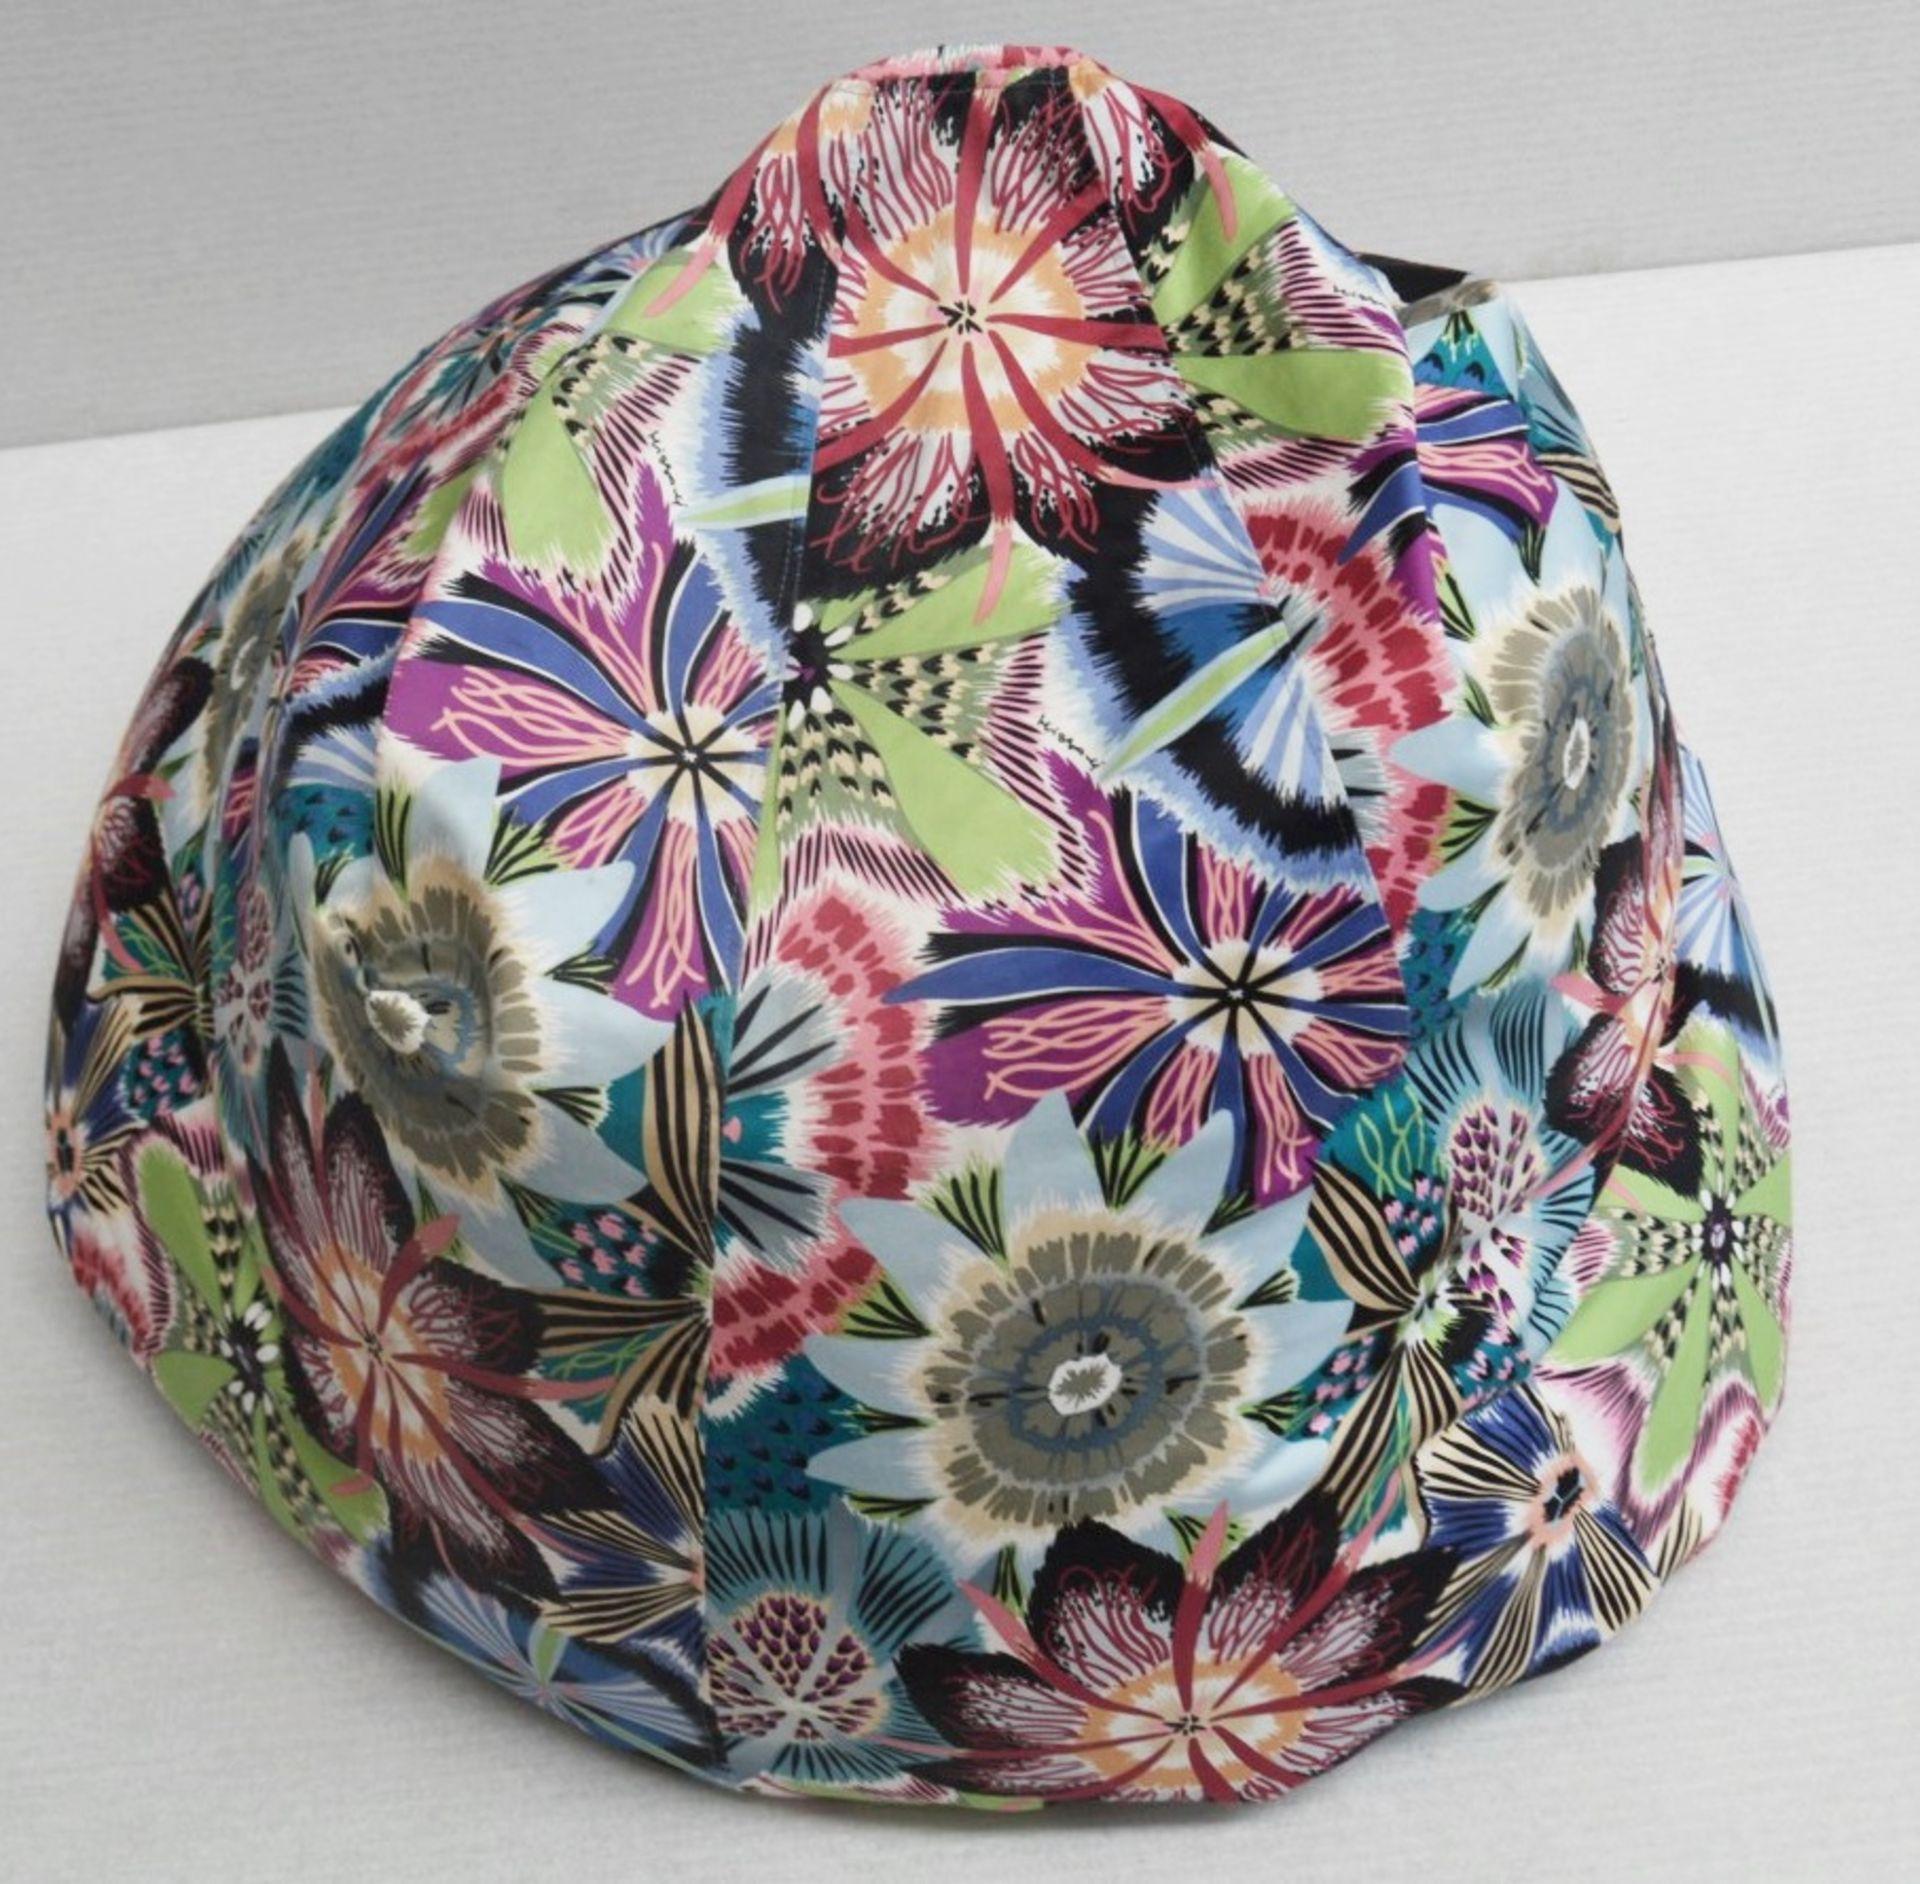 1 x Large Bean Bag Chair In 'Missoni Passiflora' Fabric - Dimensions Height 100 x Diameter 70cm - Image 5 of 5